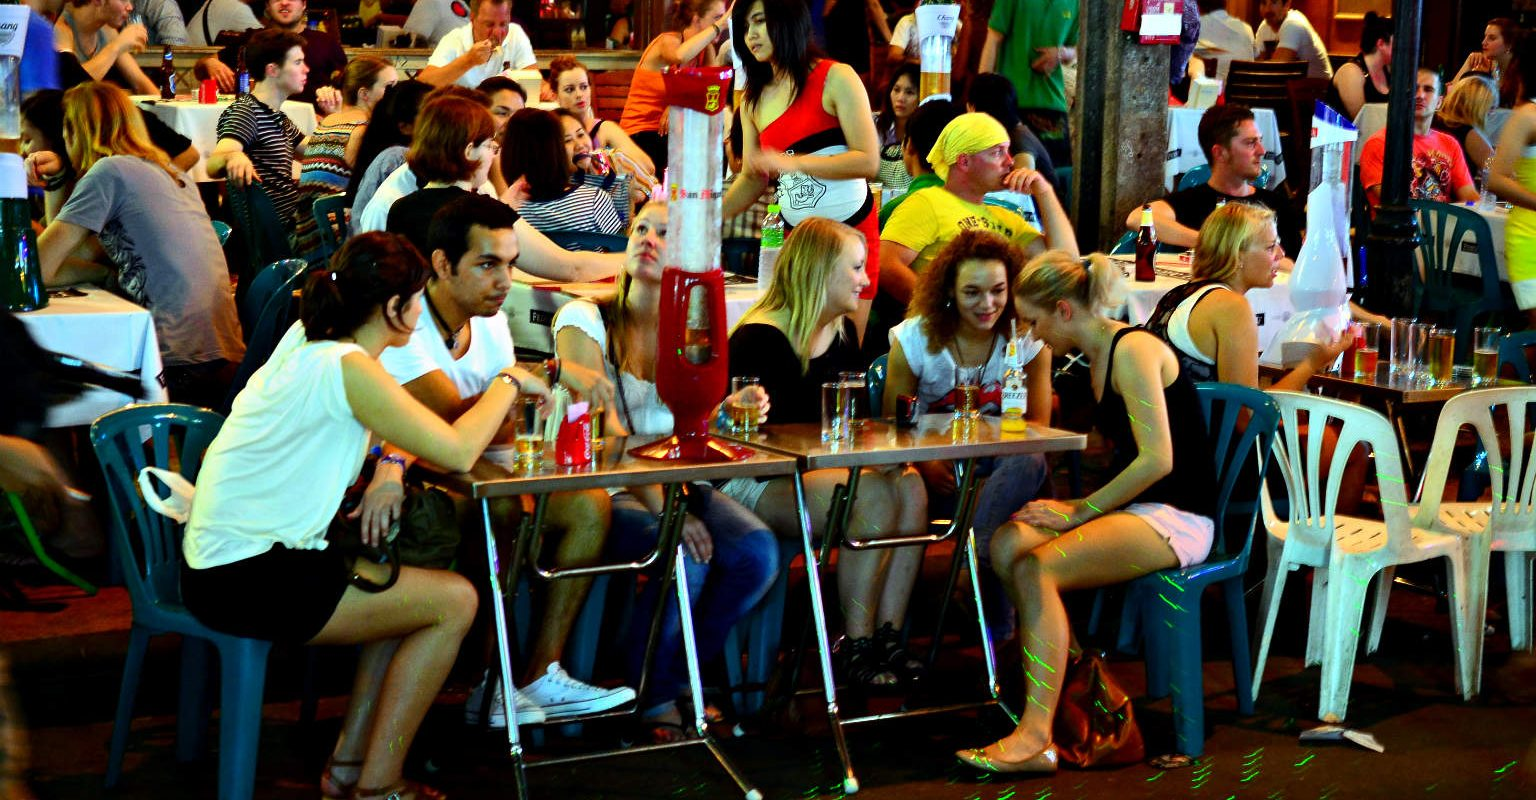 Khao san Road, drinkende mensen op straat.